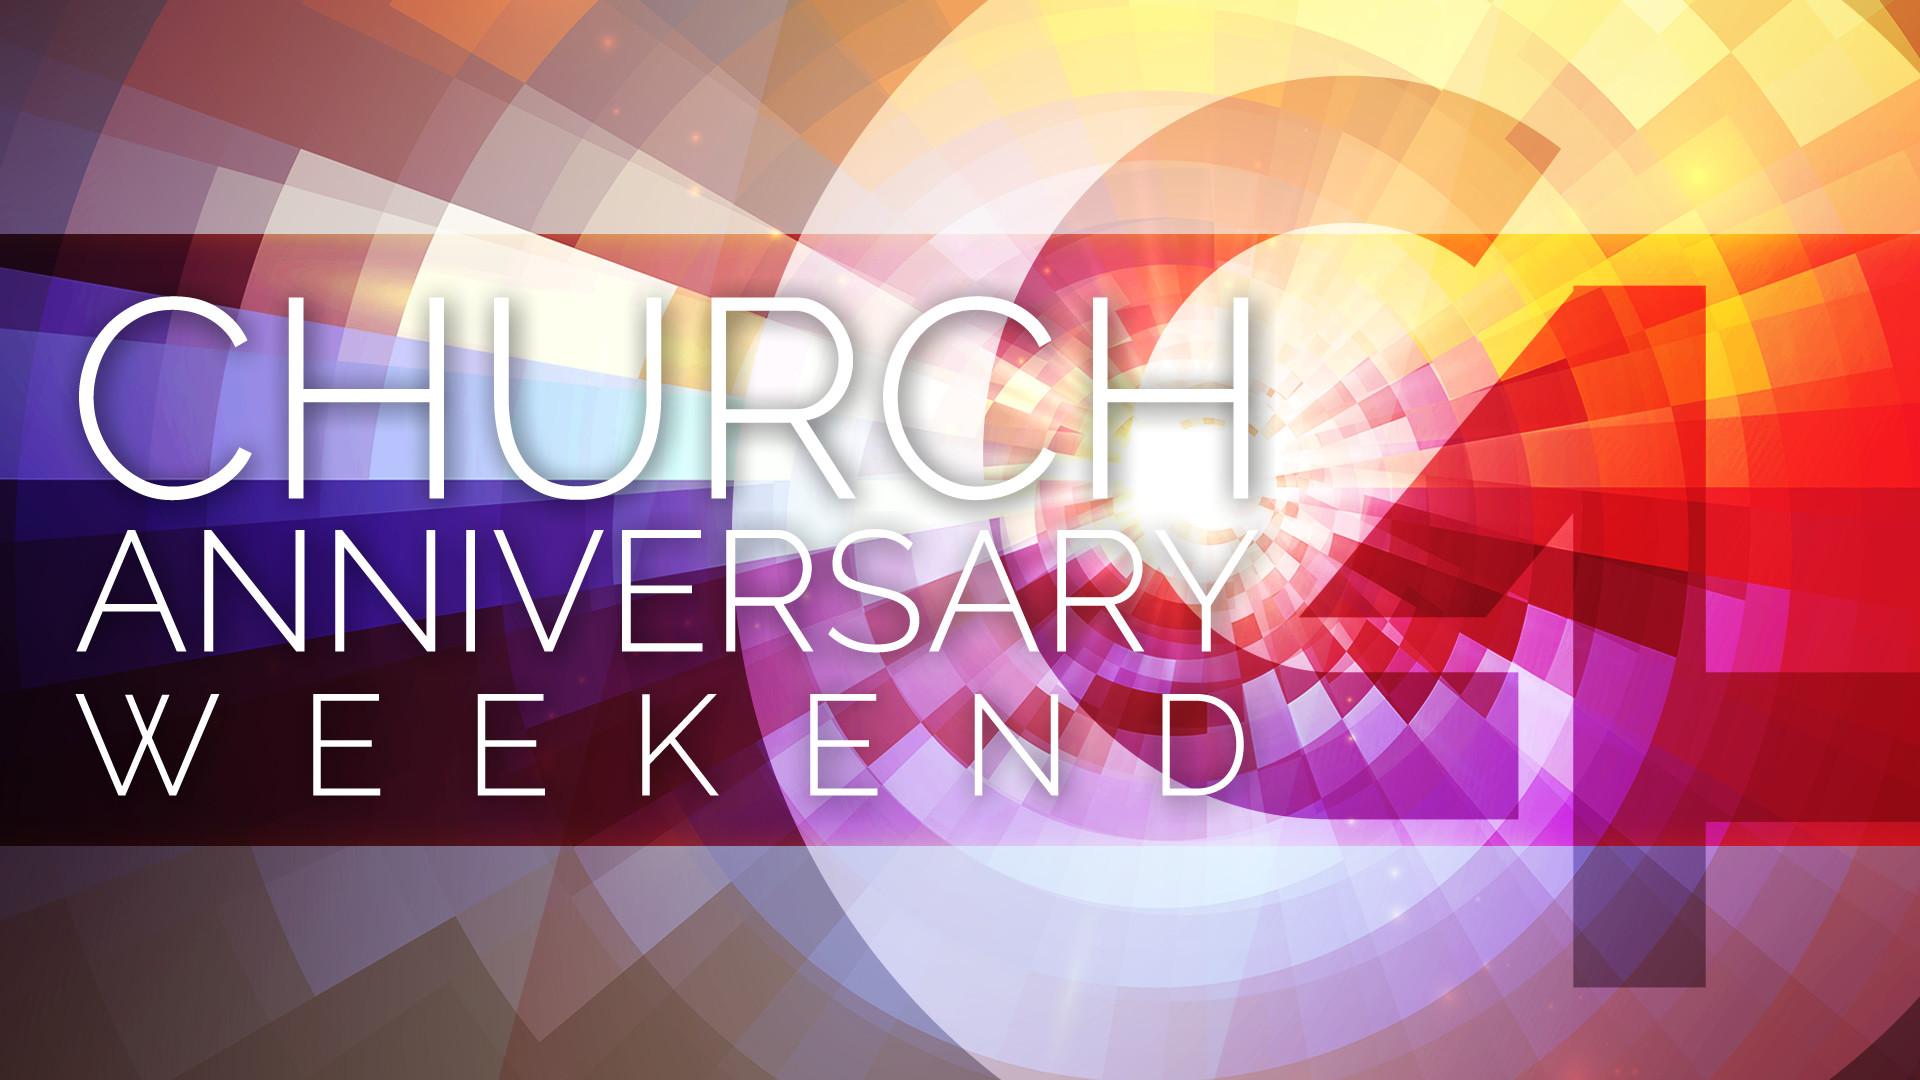 Church Anniversary Weekend